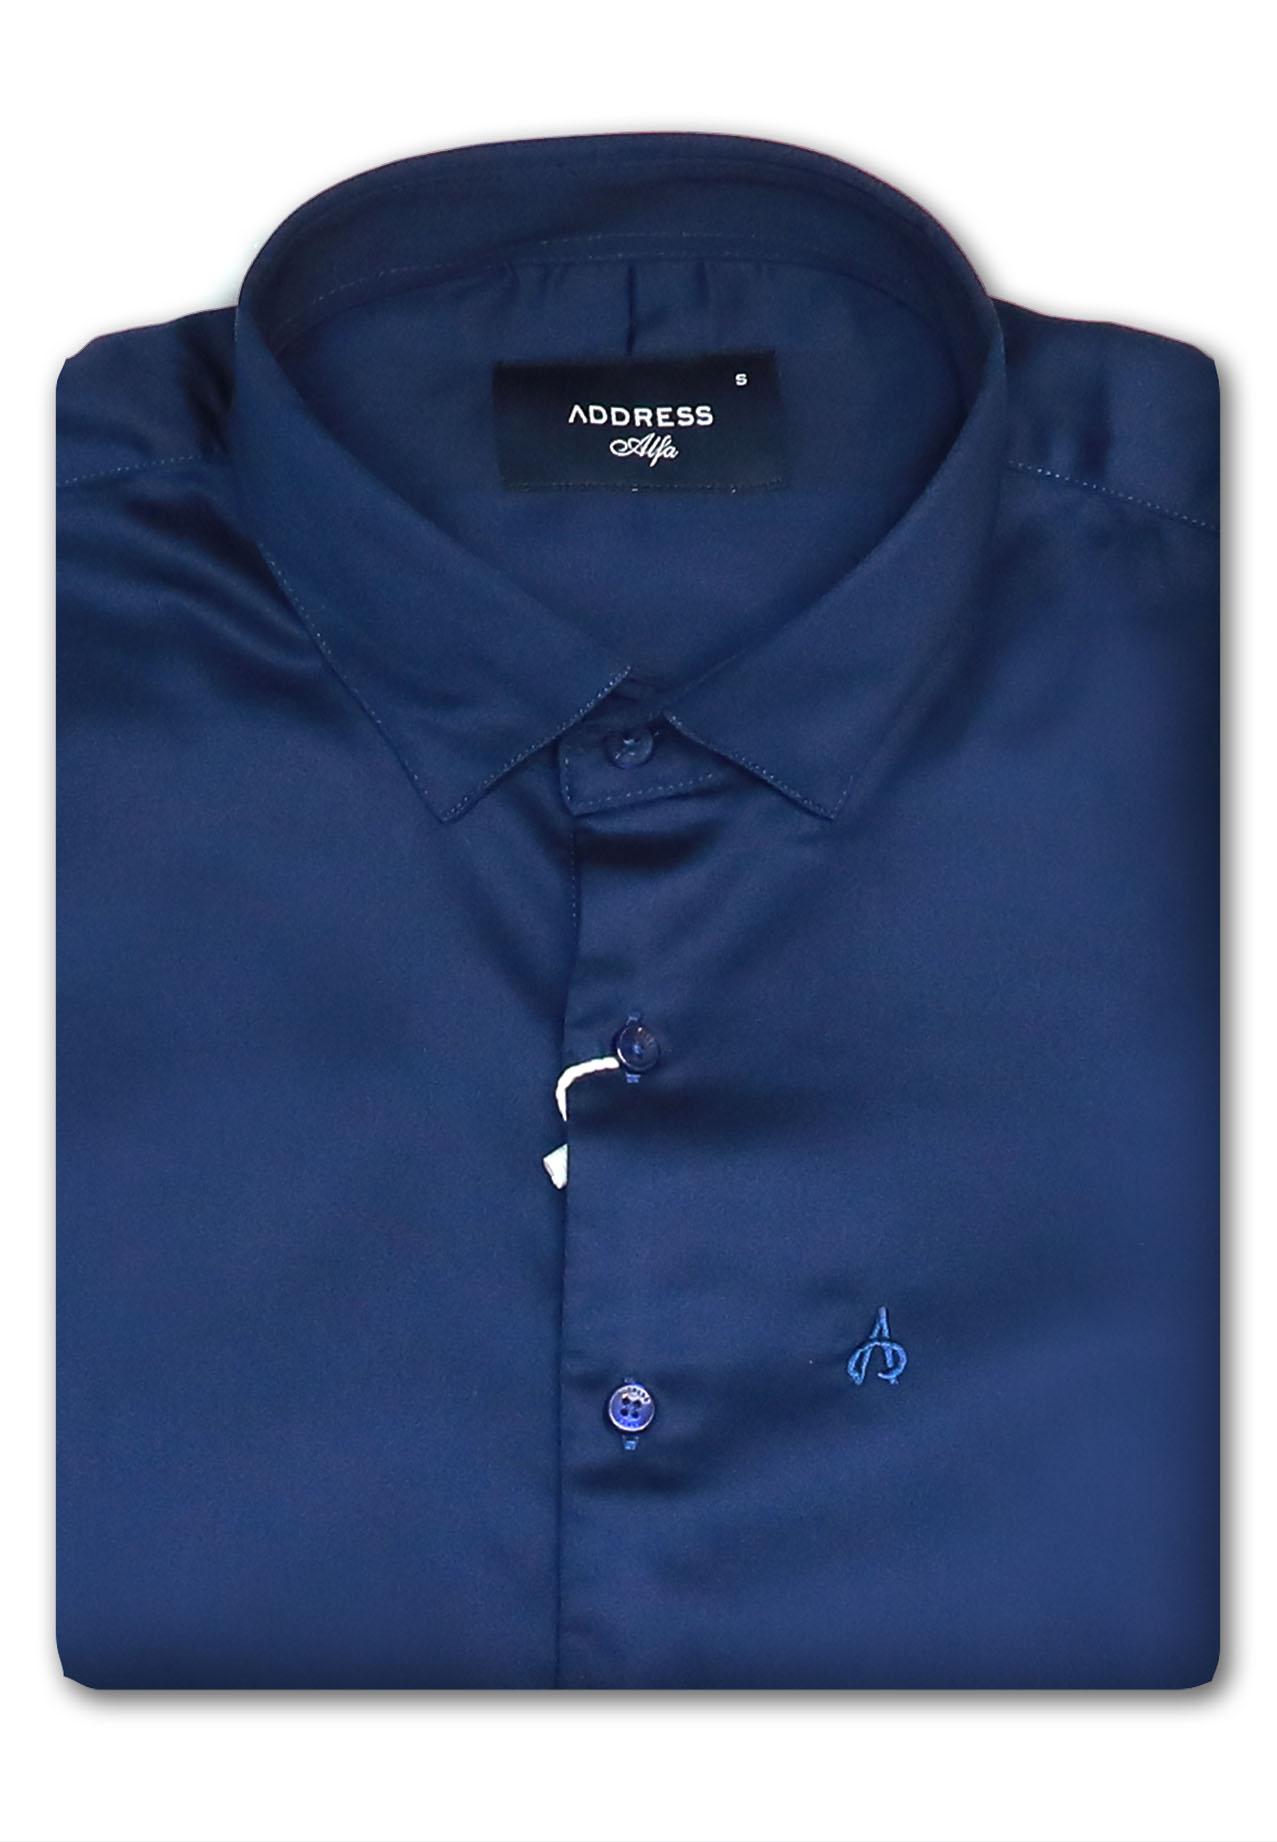 Address Formals Shirt Blue, Large